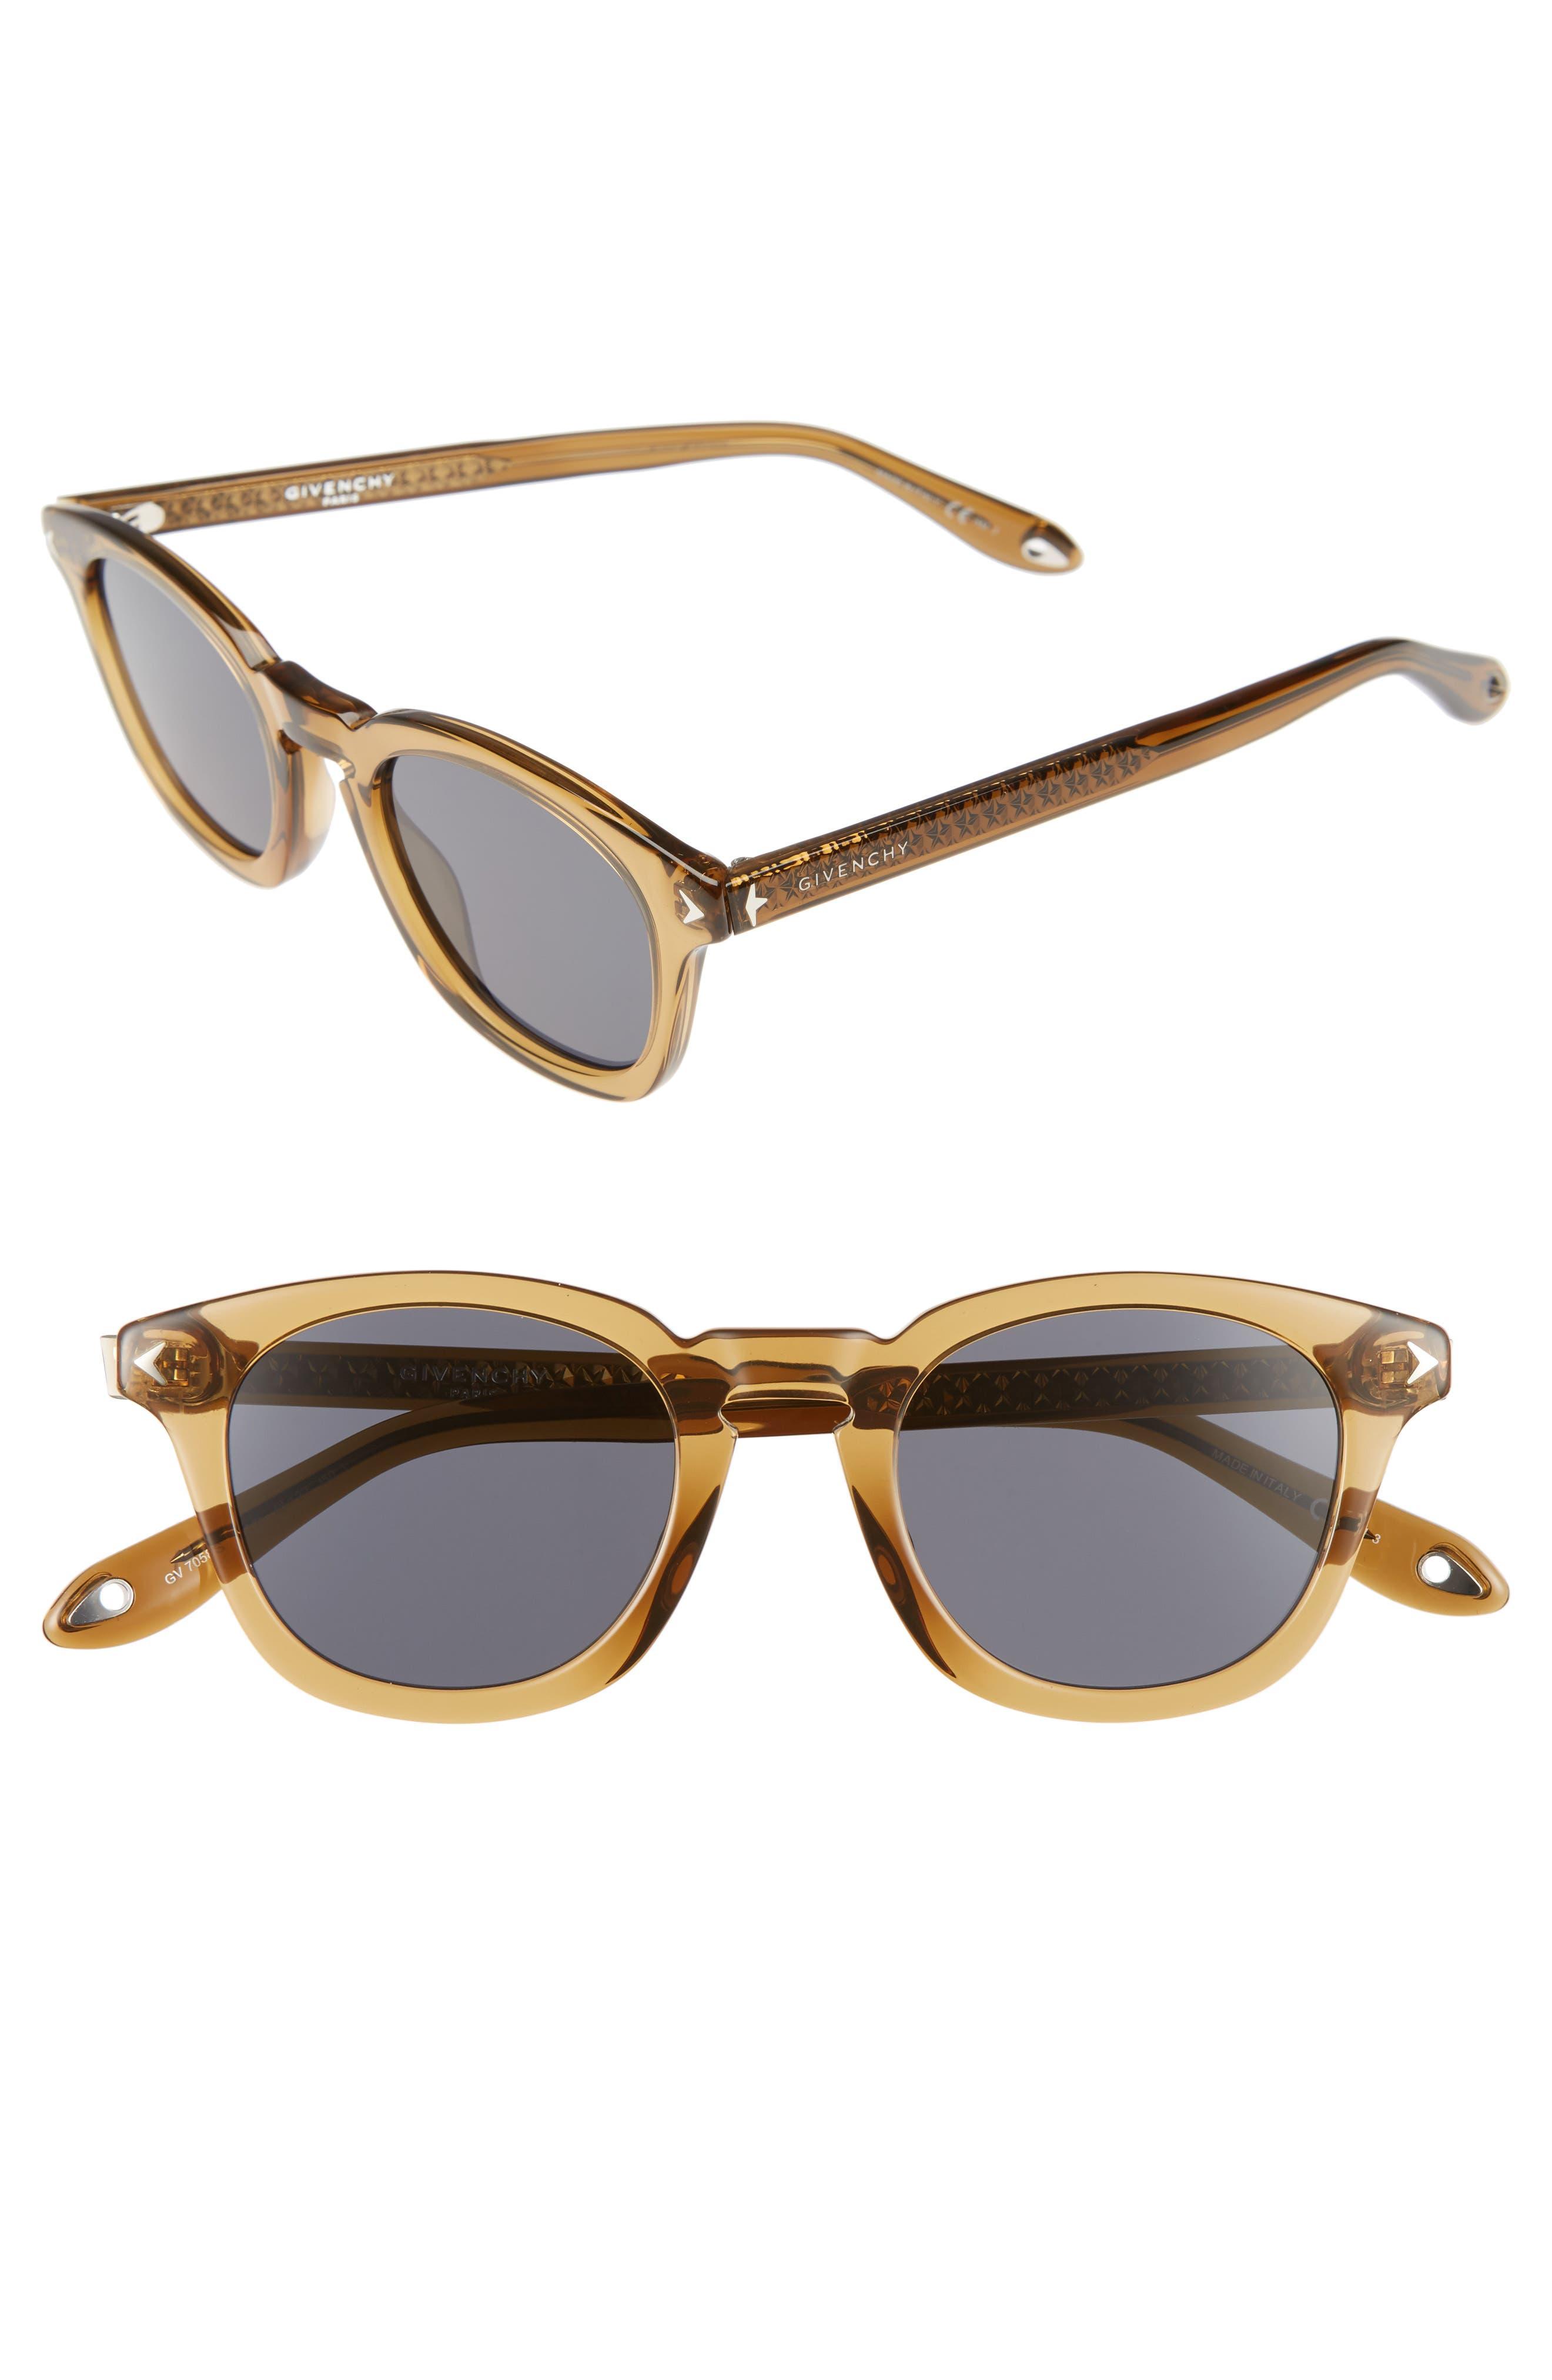 48mm Polarized Sunglasses,                         Main,                         color, Beige